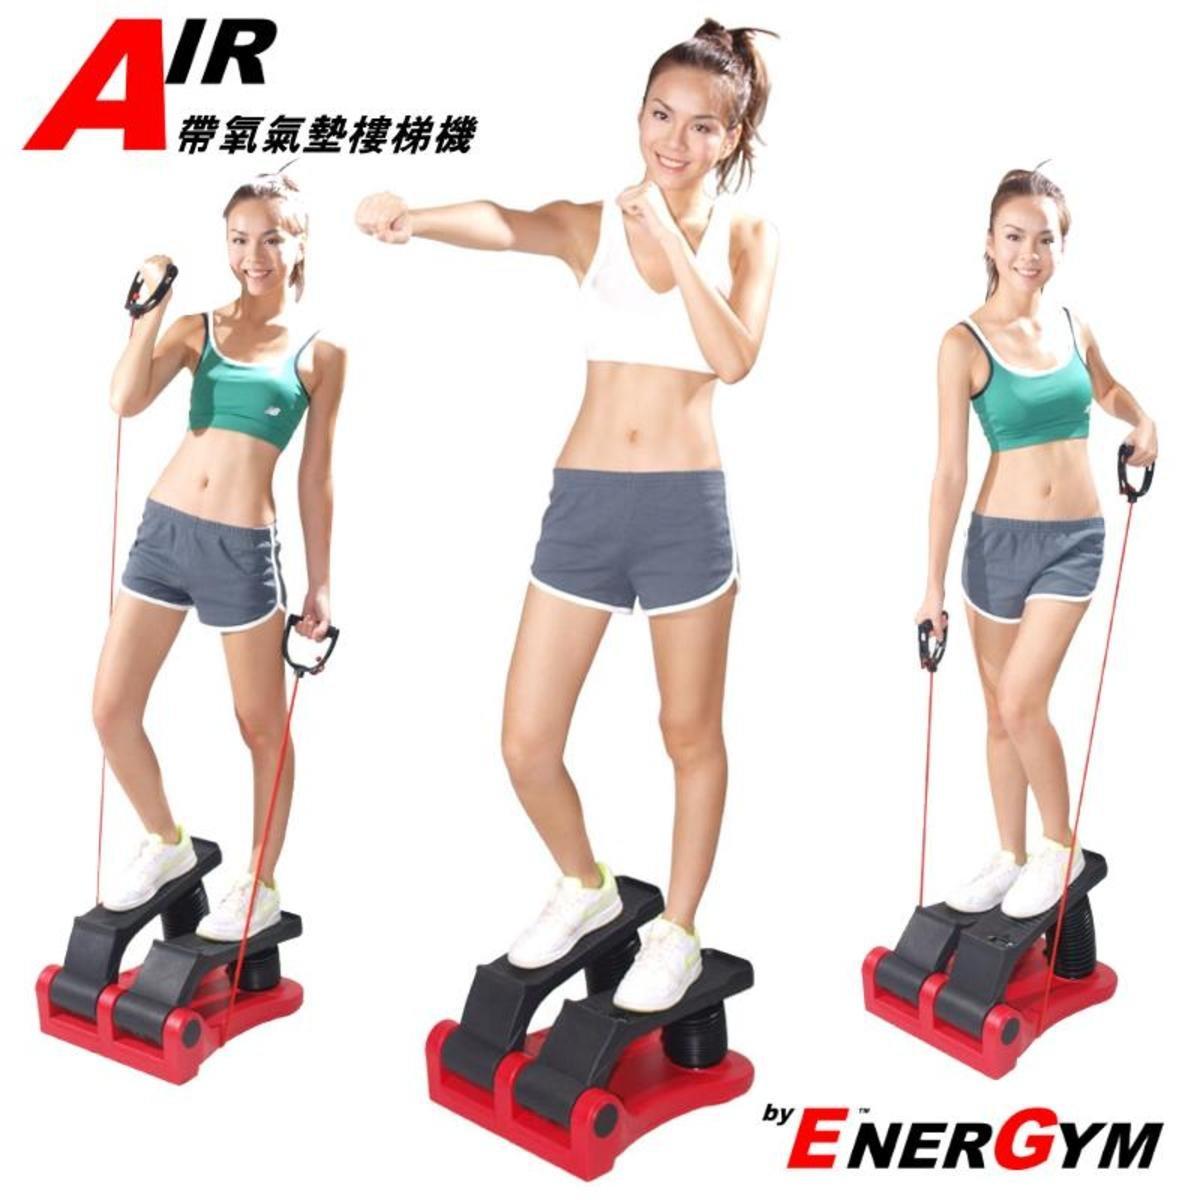 Air Stepper帶氧氣墊樓梯機